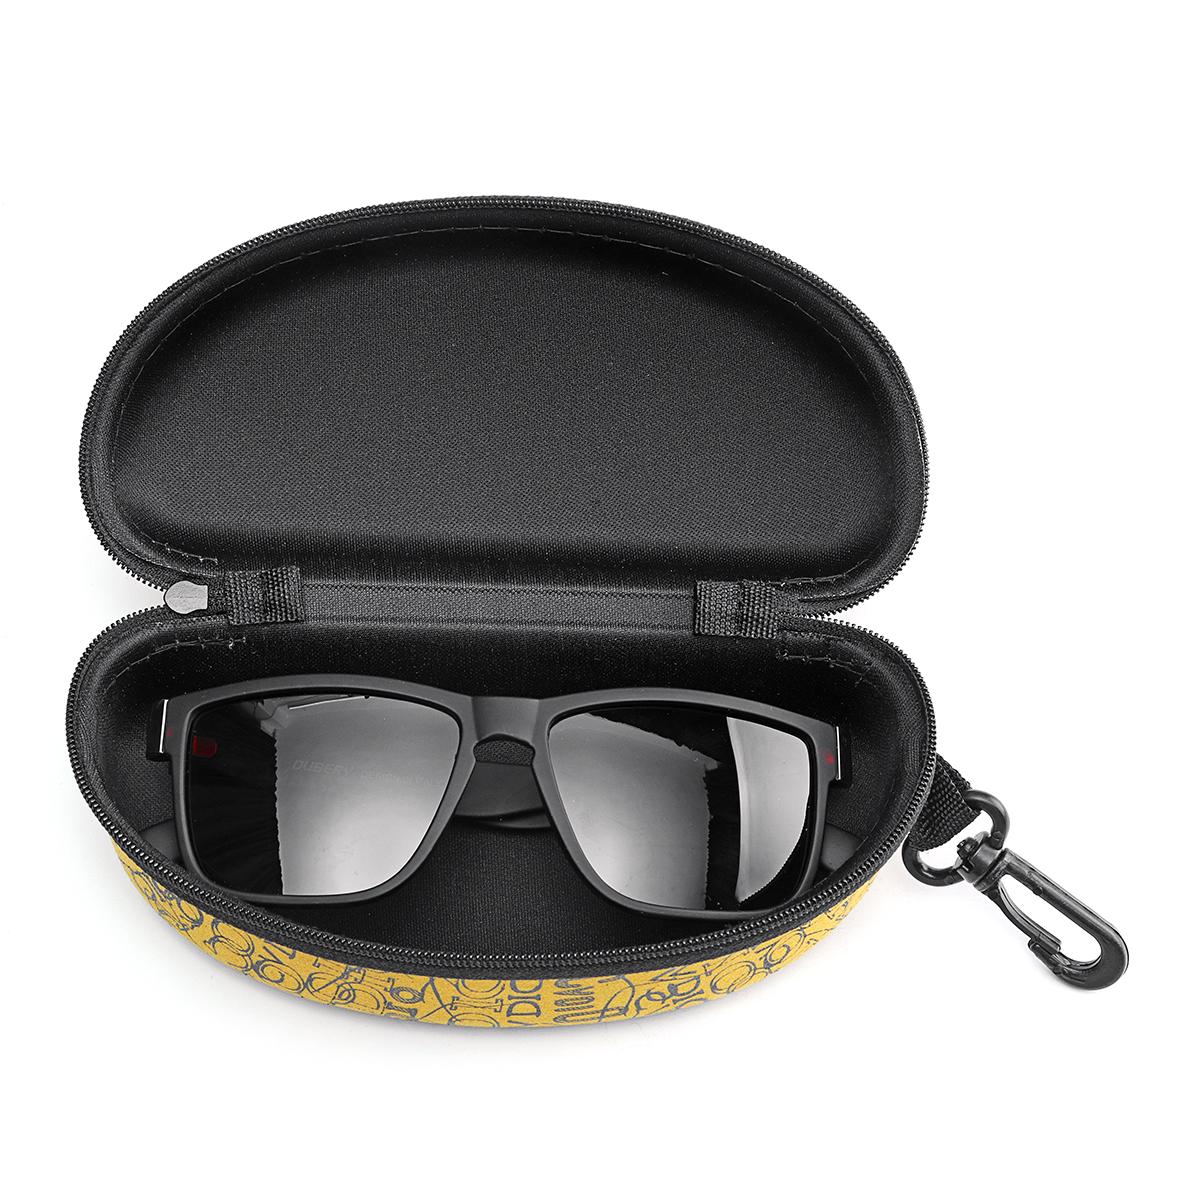 Солнцезащитные очки KDEAM Oval Коробка Hard Очки Коробка Защитные очки для очков Чехол